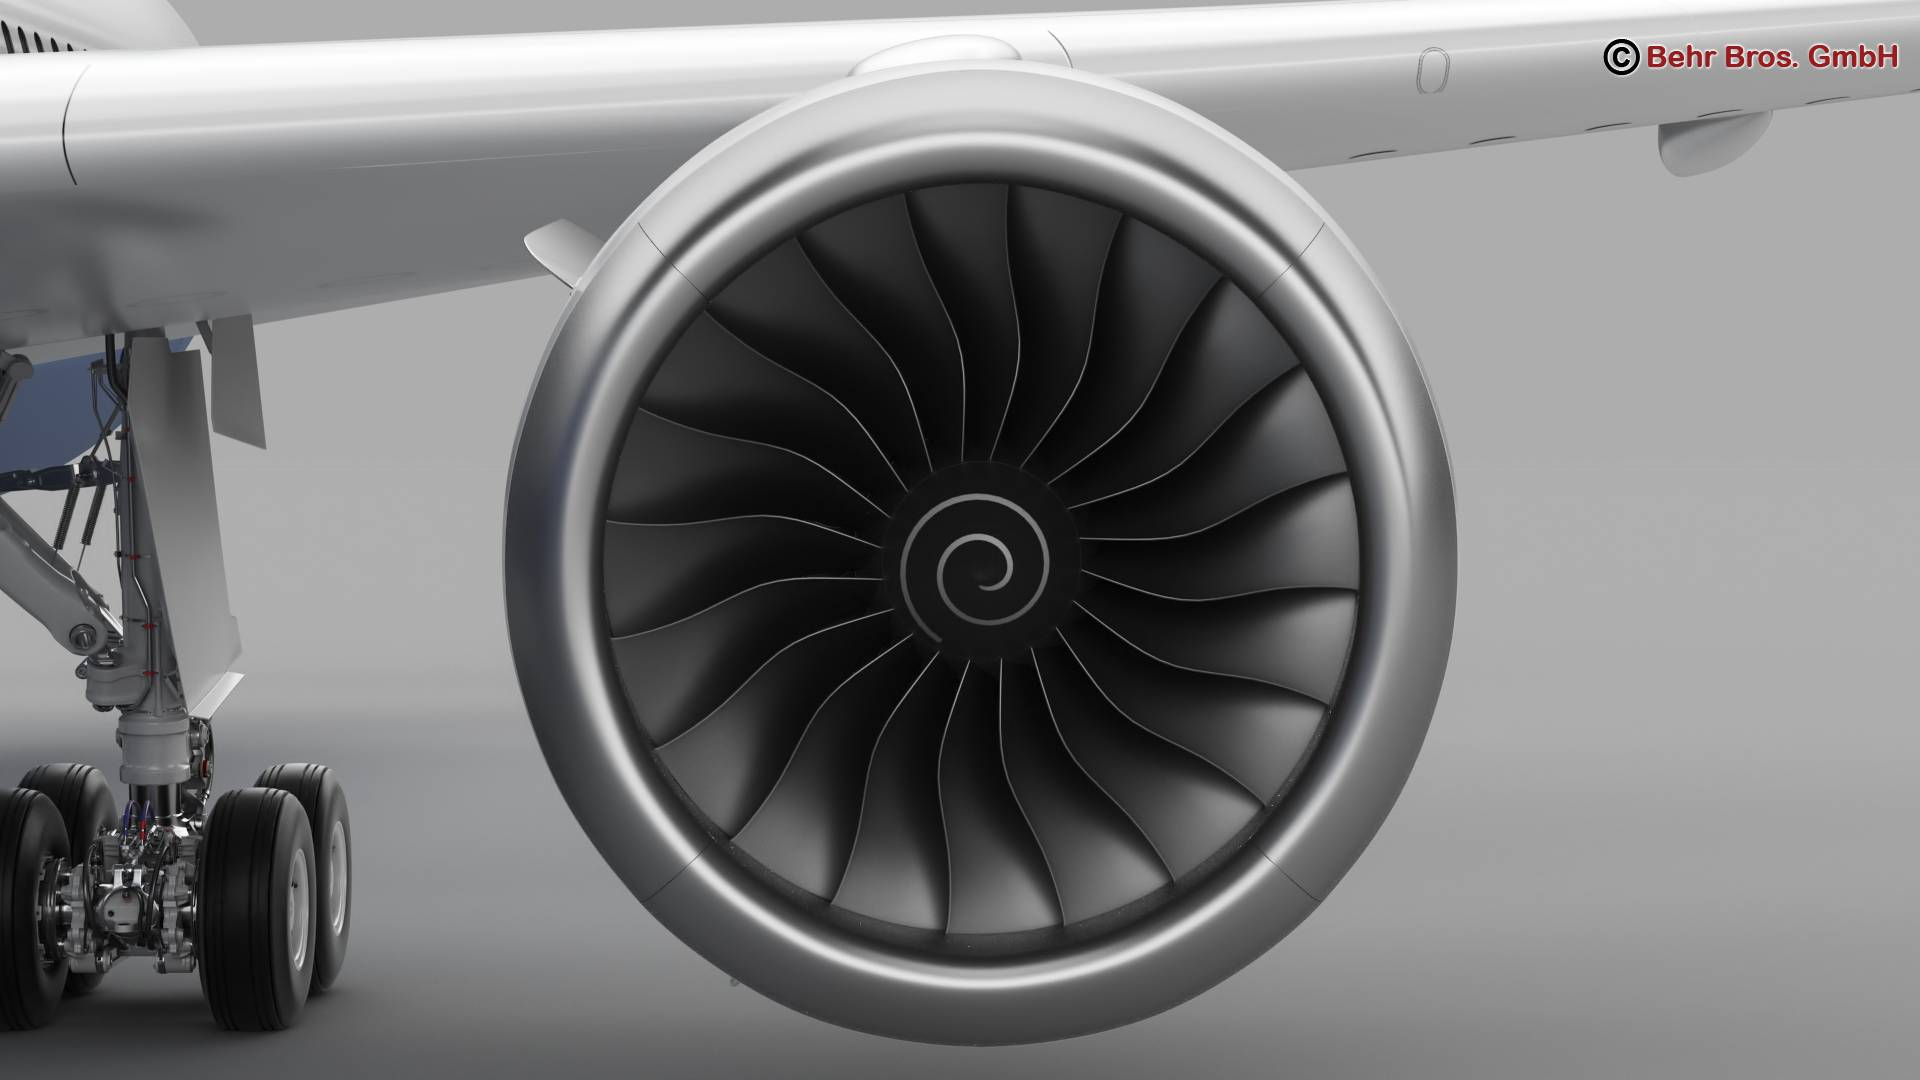 Boeing 787-8 3d gerð 3ds max fbx c4d lwo ma mb obj 251354